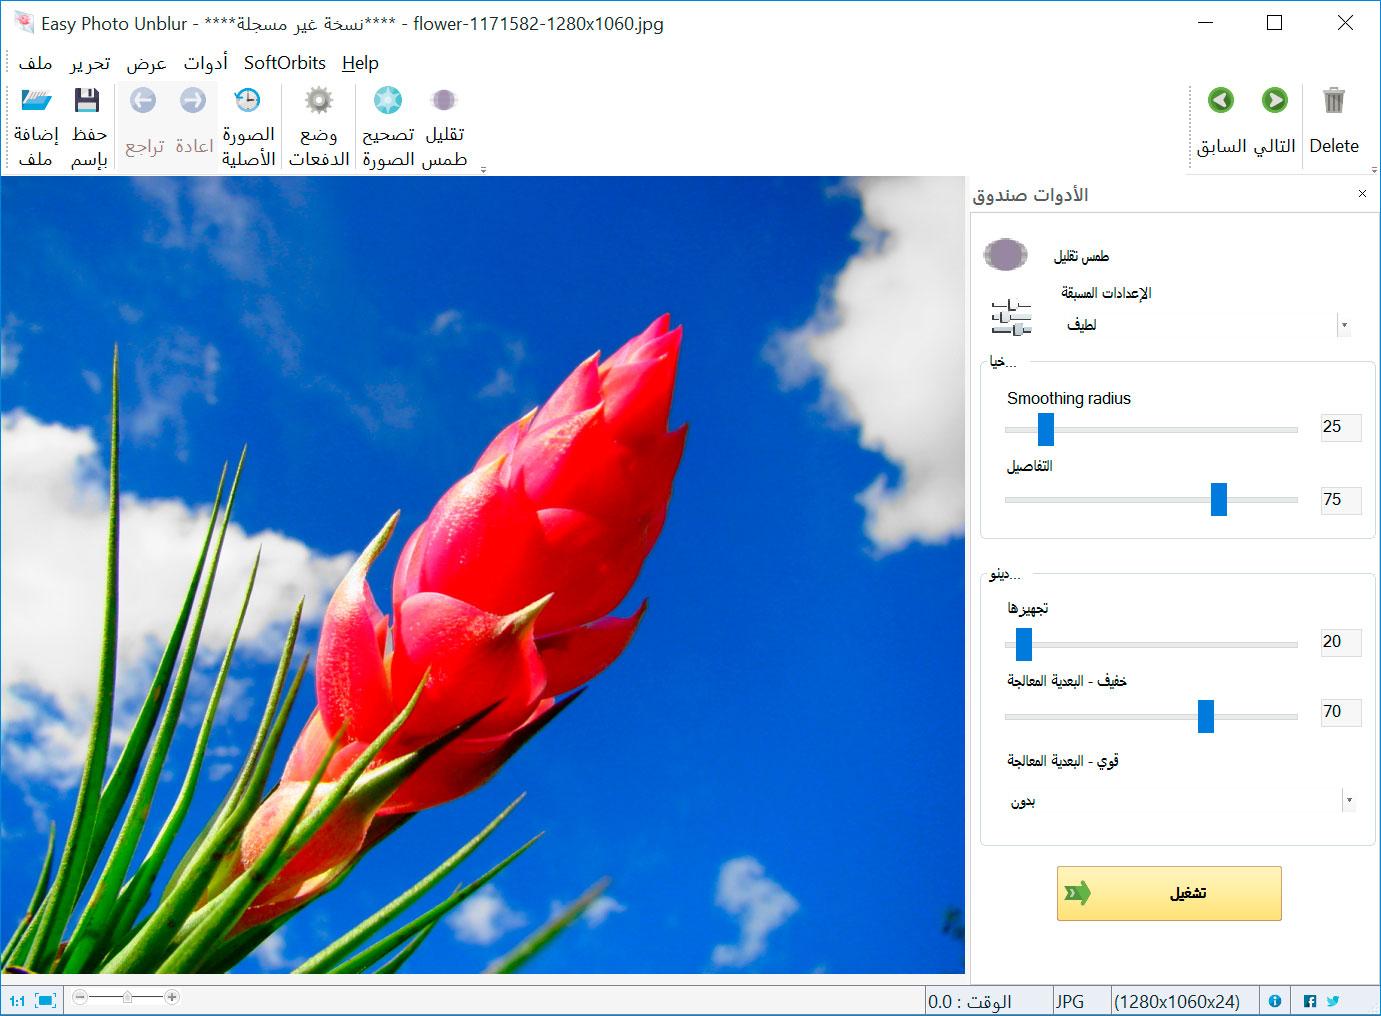 Easy Photo Unblur صور من البرنامج